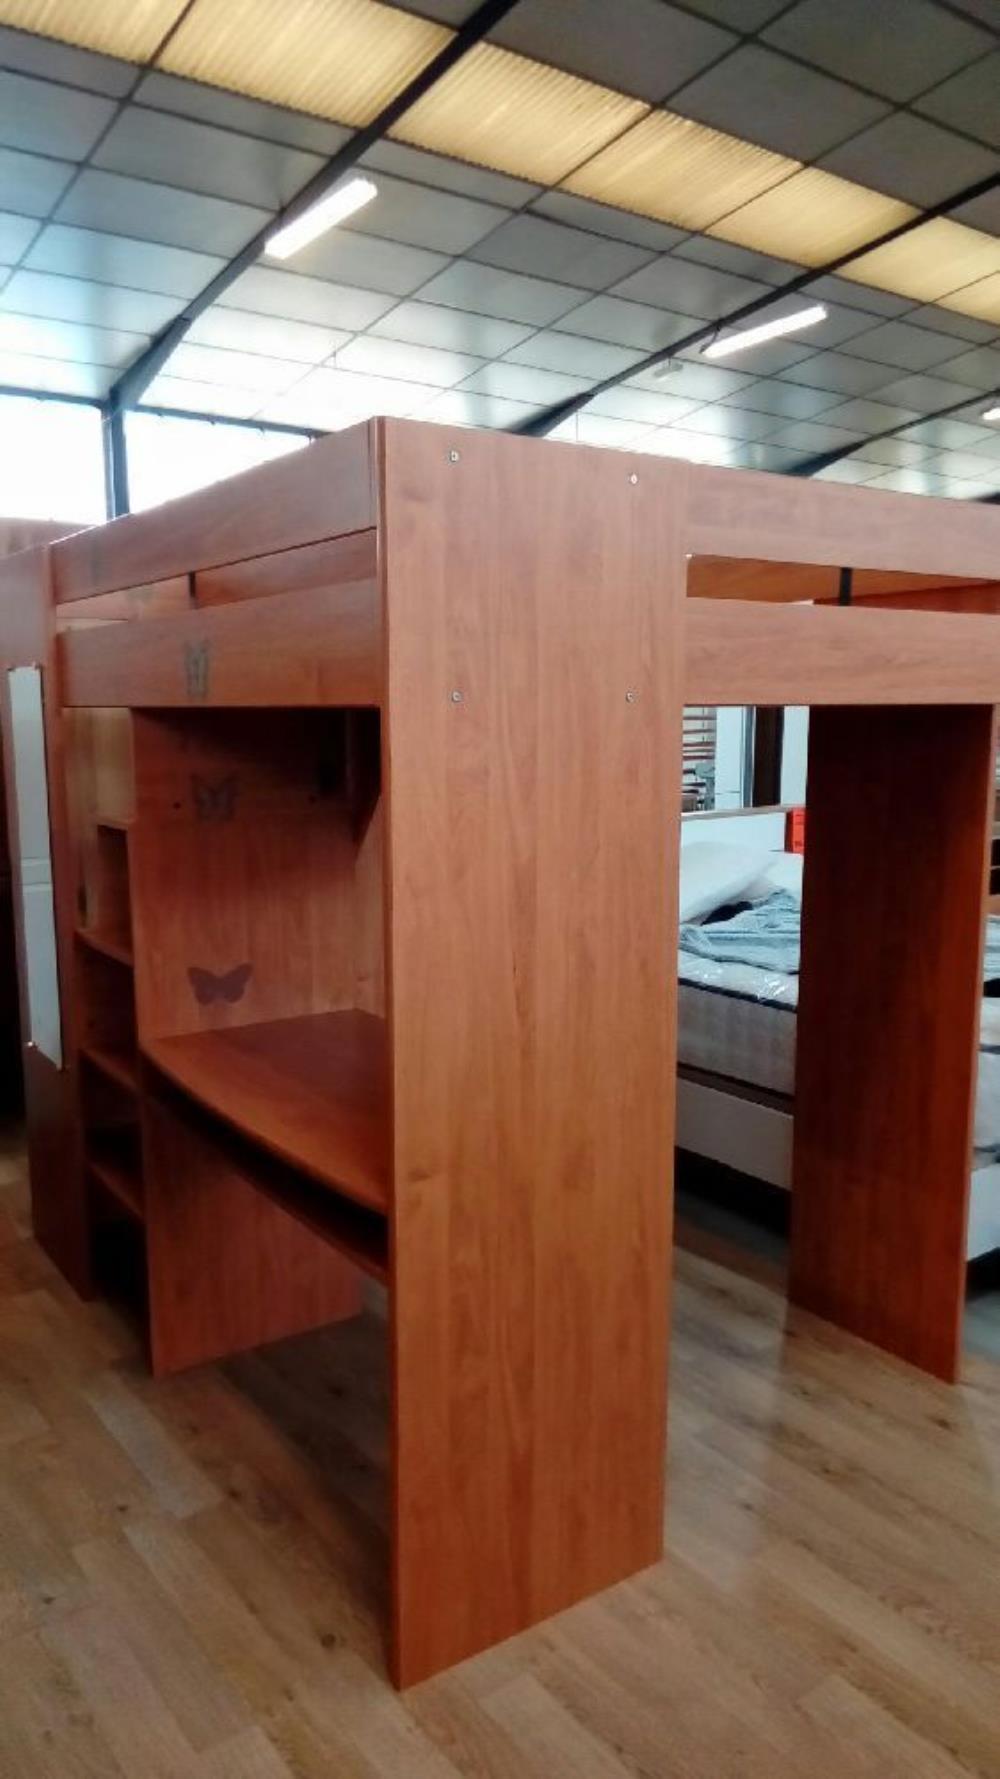 lit mezzanine gaultier occasion troc richwiller. Black Bedroom Furniture Sets. Home Design Ideas